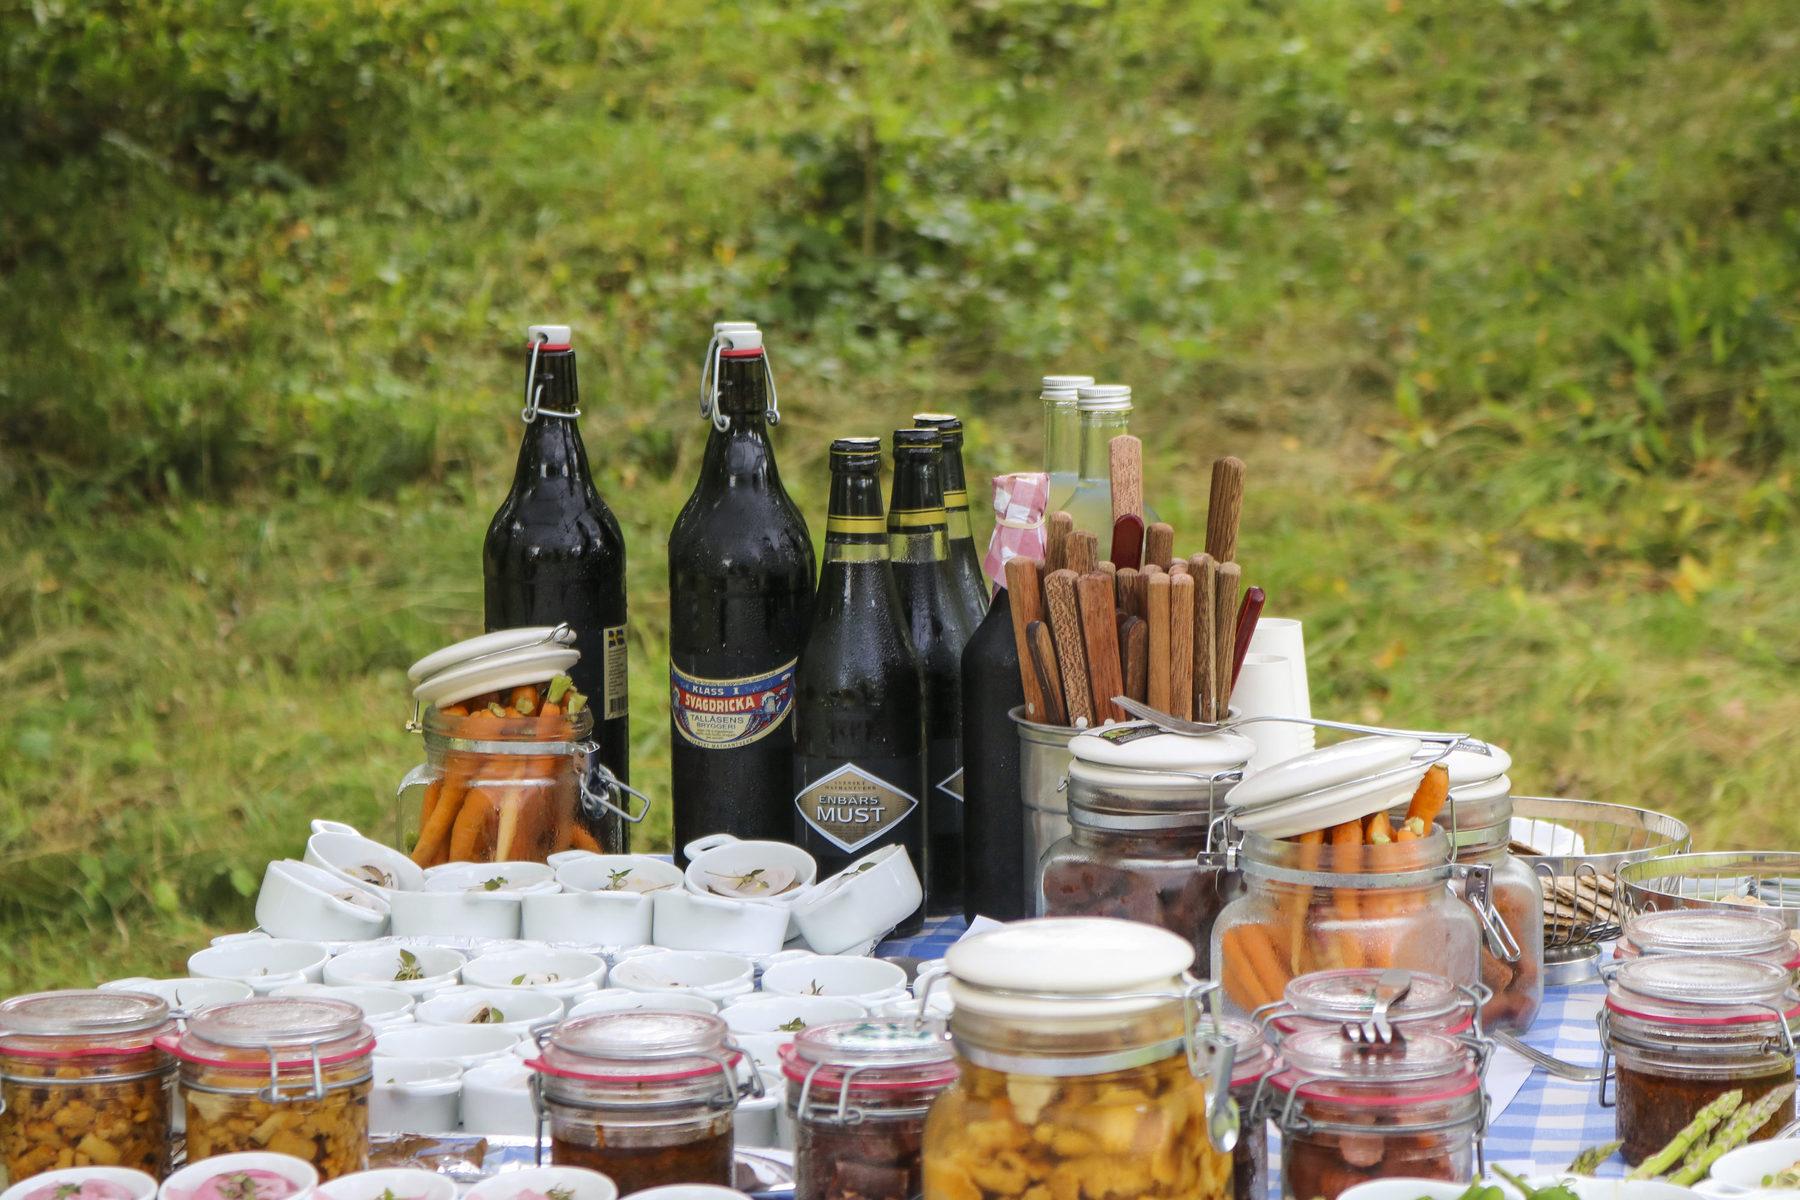 Guided food walk at Korrö